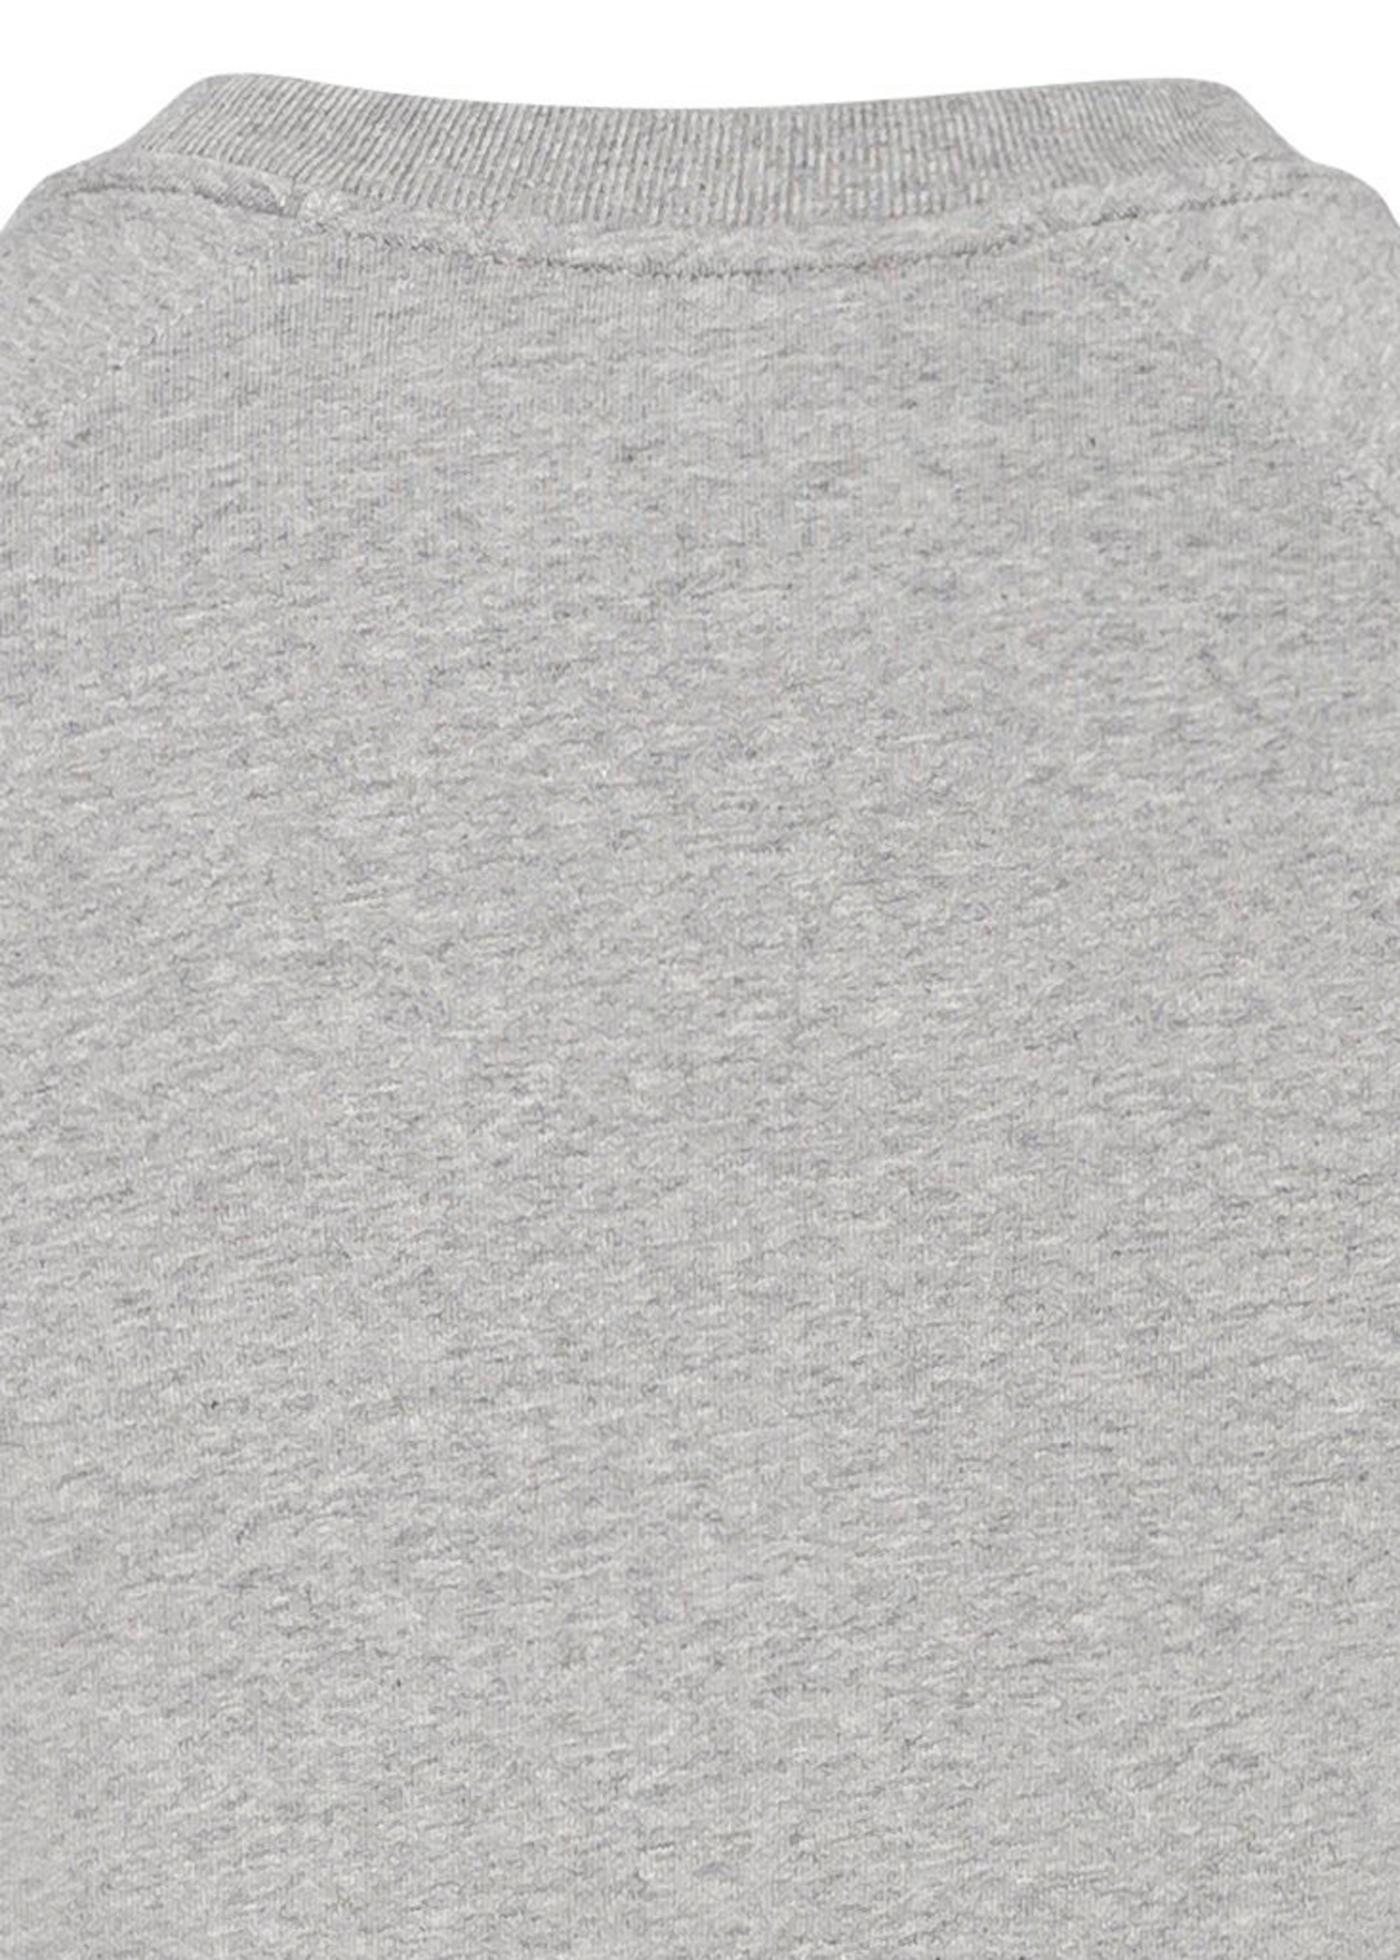 GREY FOX HEAD PATCH CLASSIC SWEATSHIRT image number 3